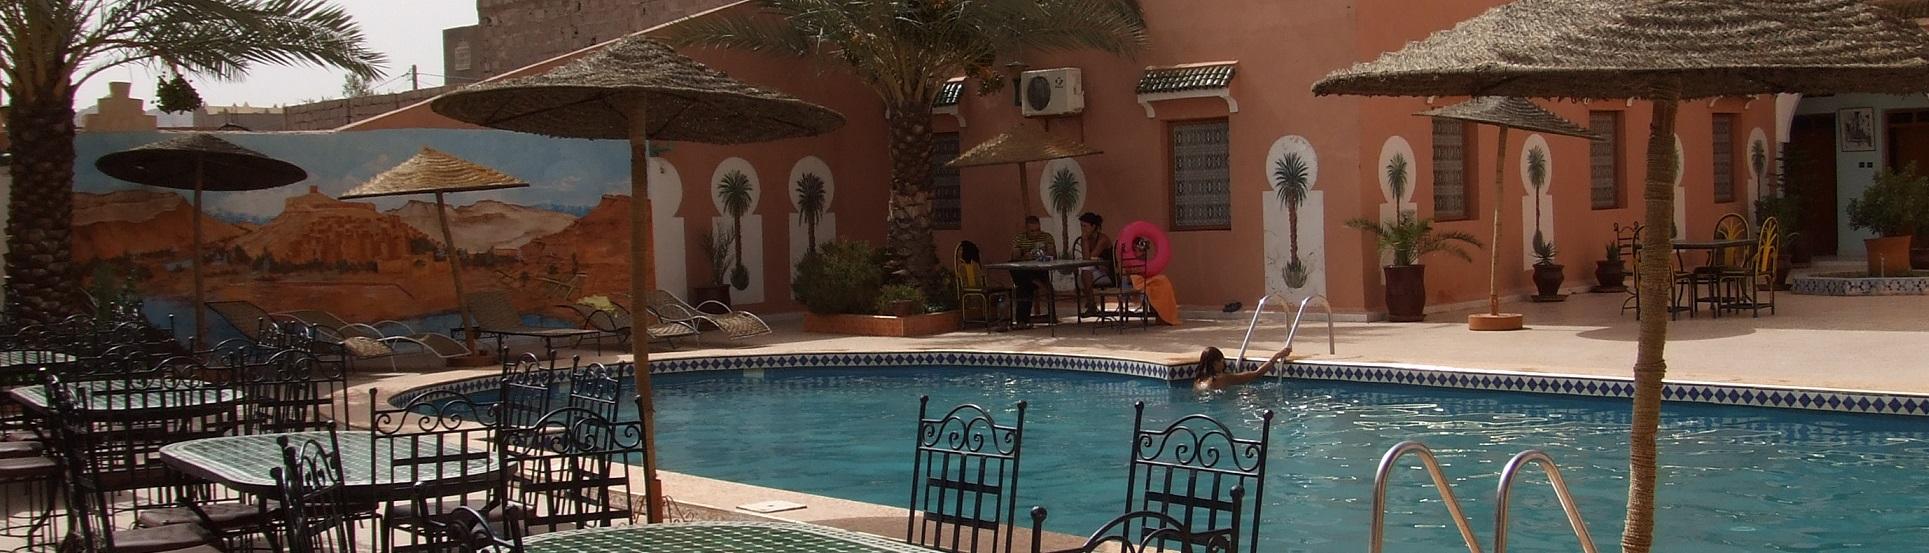 Pool-1929x553